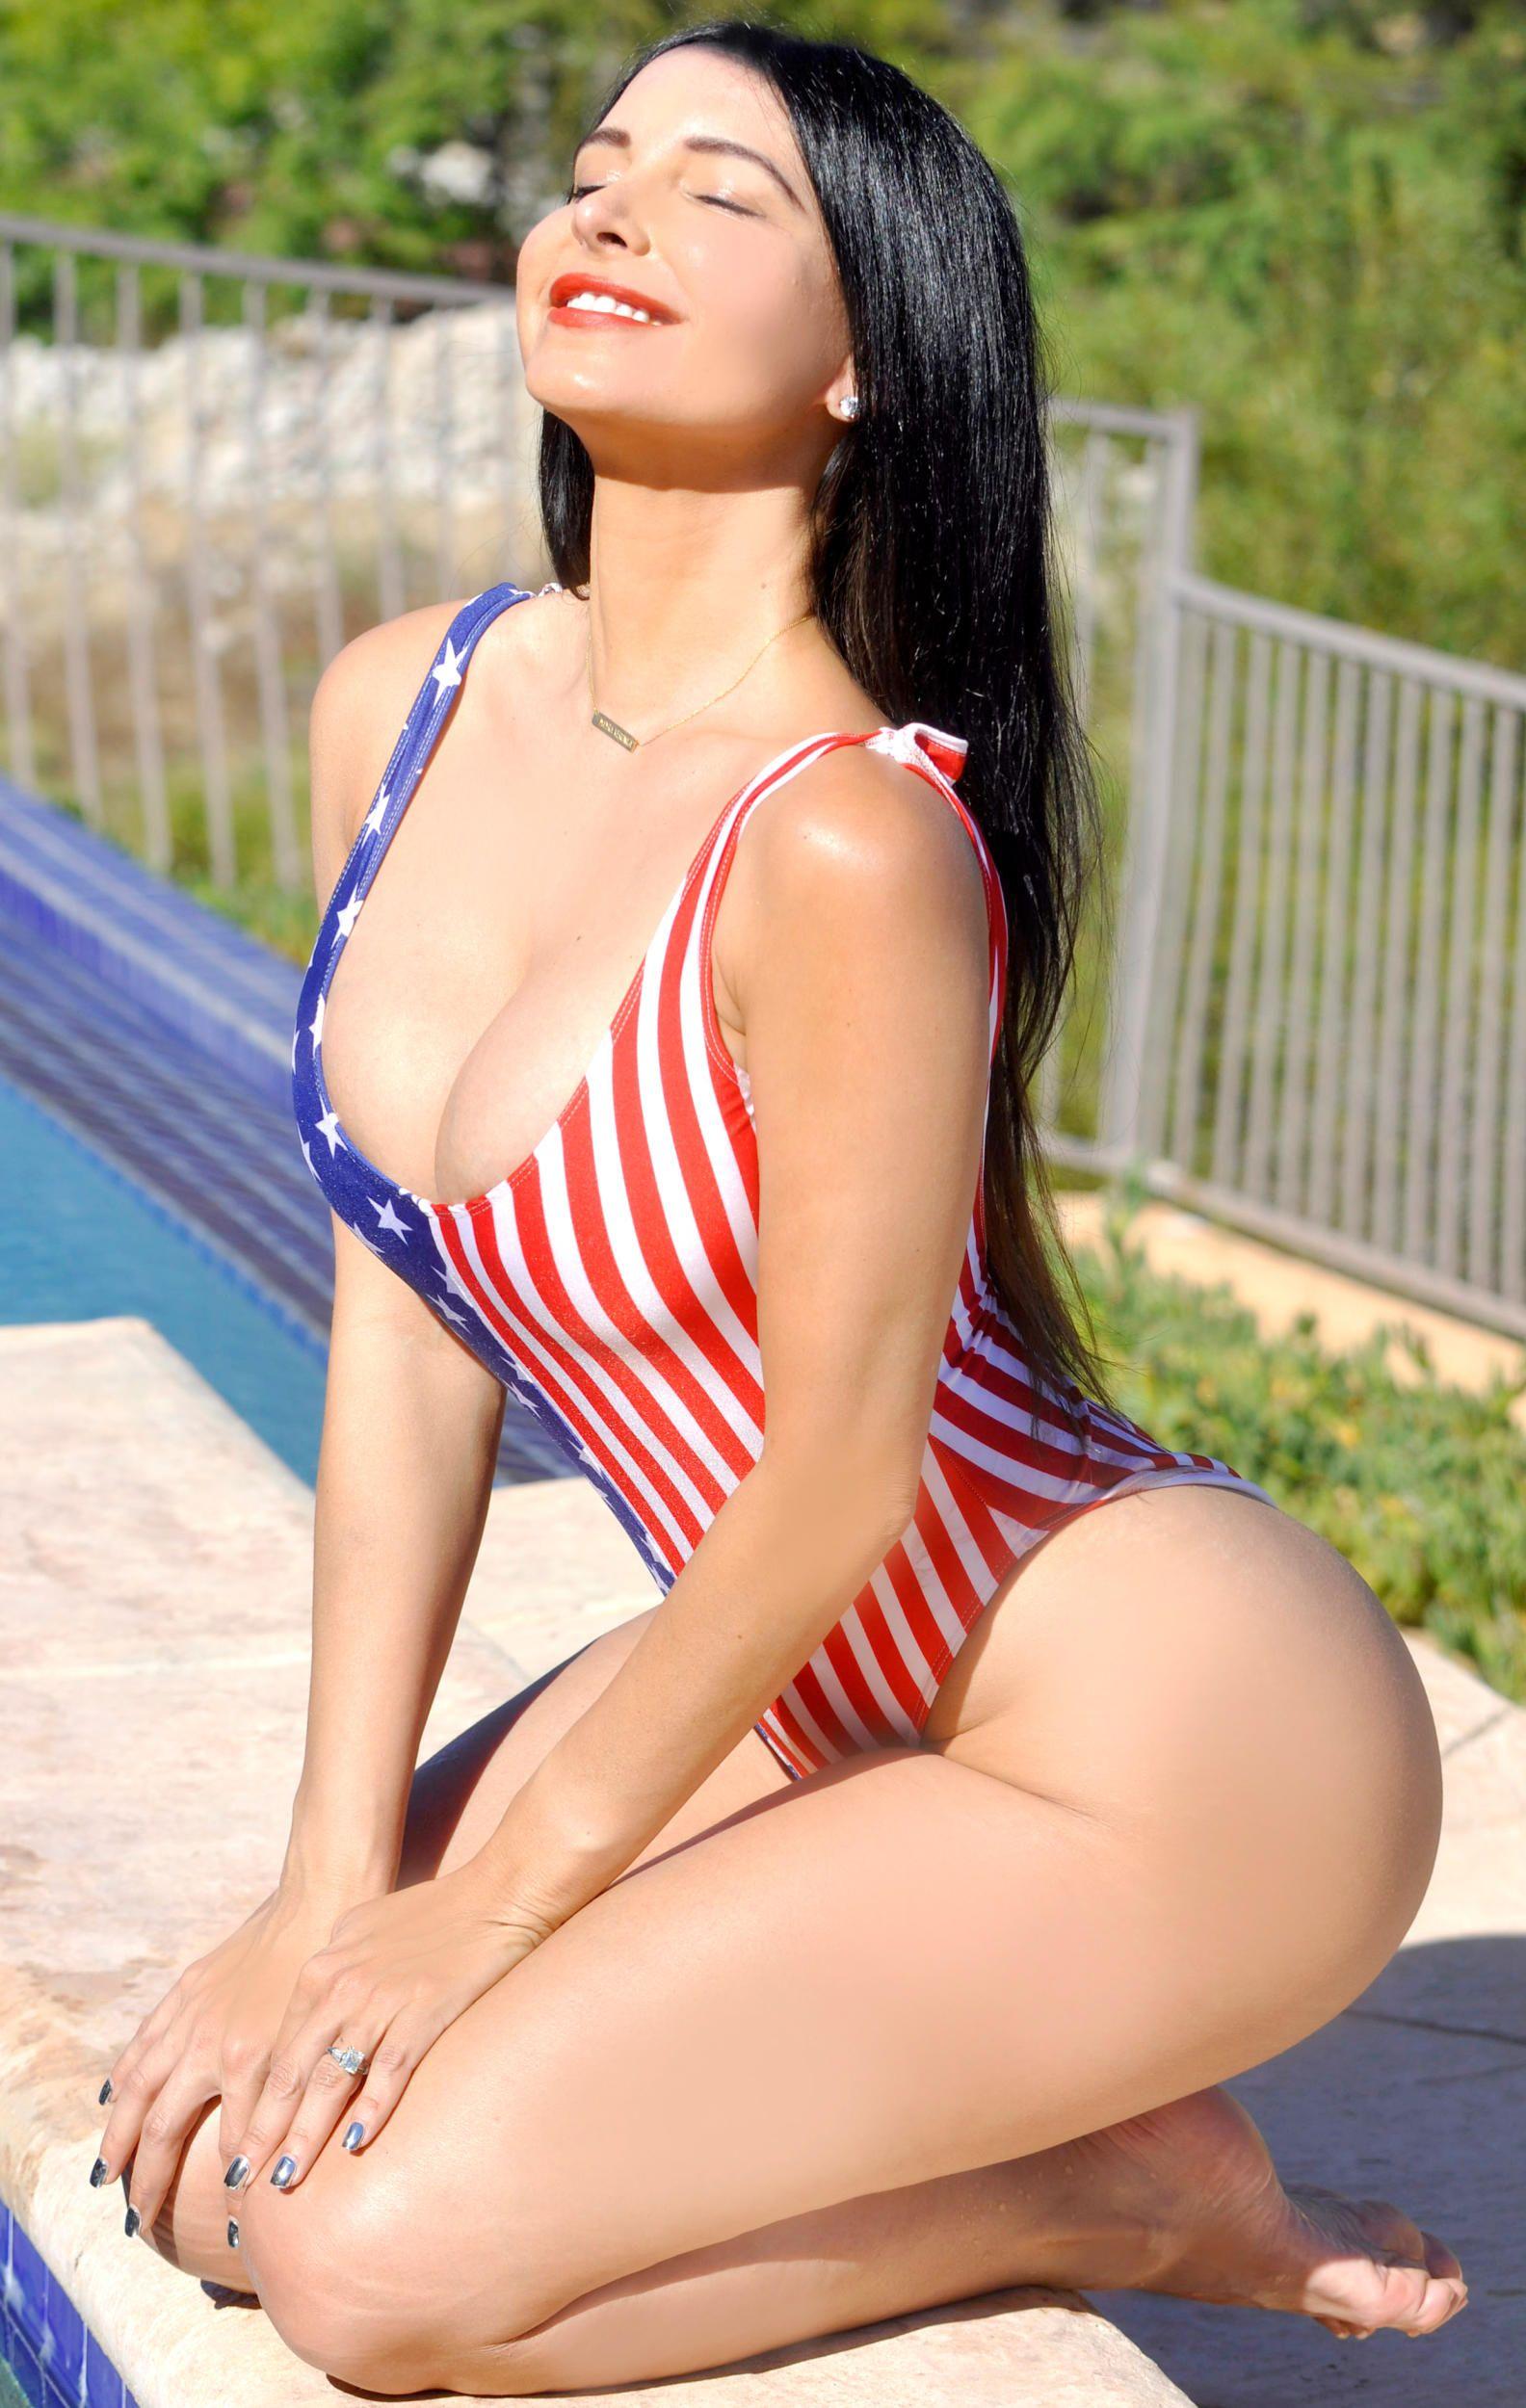 Instagram Mayra Veronica naked (45 photos), Tits, Sideboobs, Twitter, cameltoe 2019